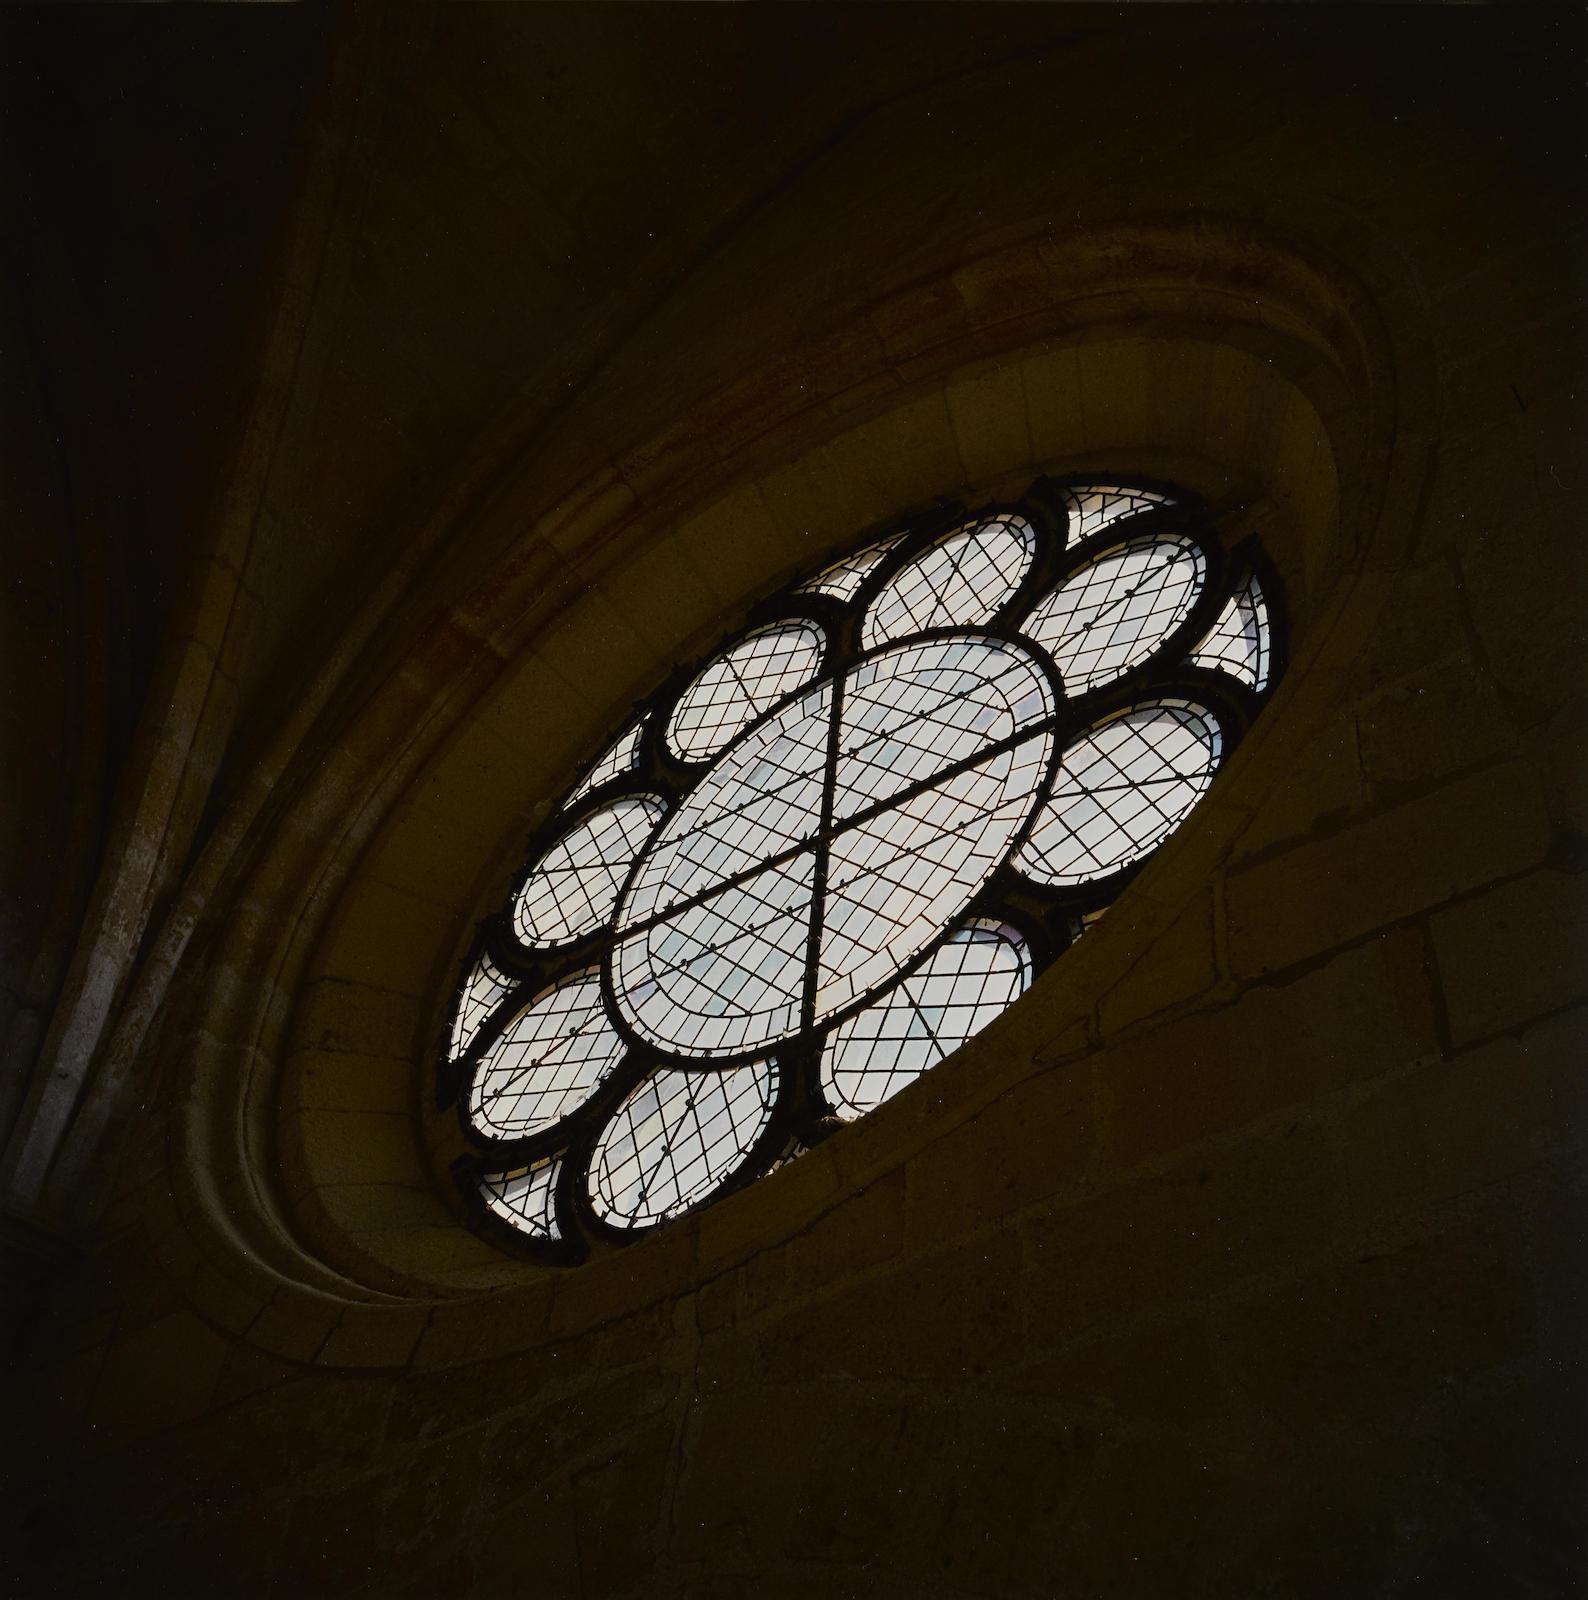 Jan Dibbets-Ten Windows (I. Paliano, 1996; II. Soissons, 1989; III. Sankt Gallen, 1995; IV. Venezia, 1997; V. Amsterdam, 1991; VI. Wein, 1990; VII. Tilburg, 1997; VIII. Ludwigsburg, 1995; IX. Amsterdam, 1991; X. Wayzata, 1988)-1997